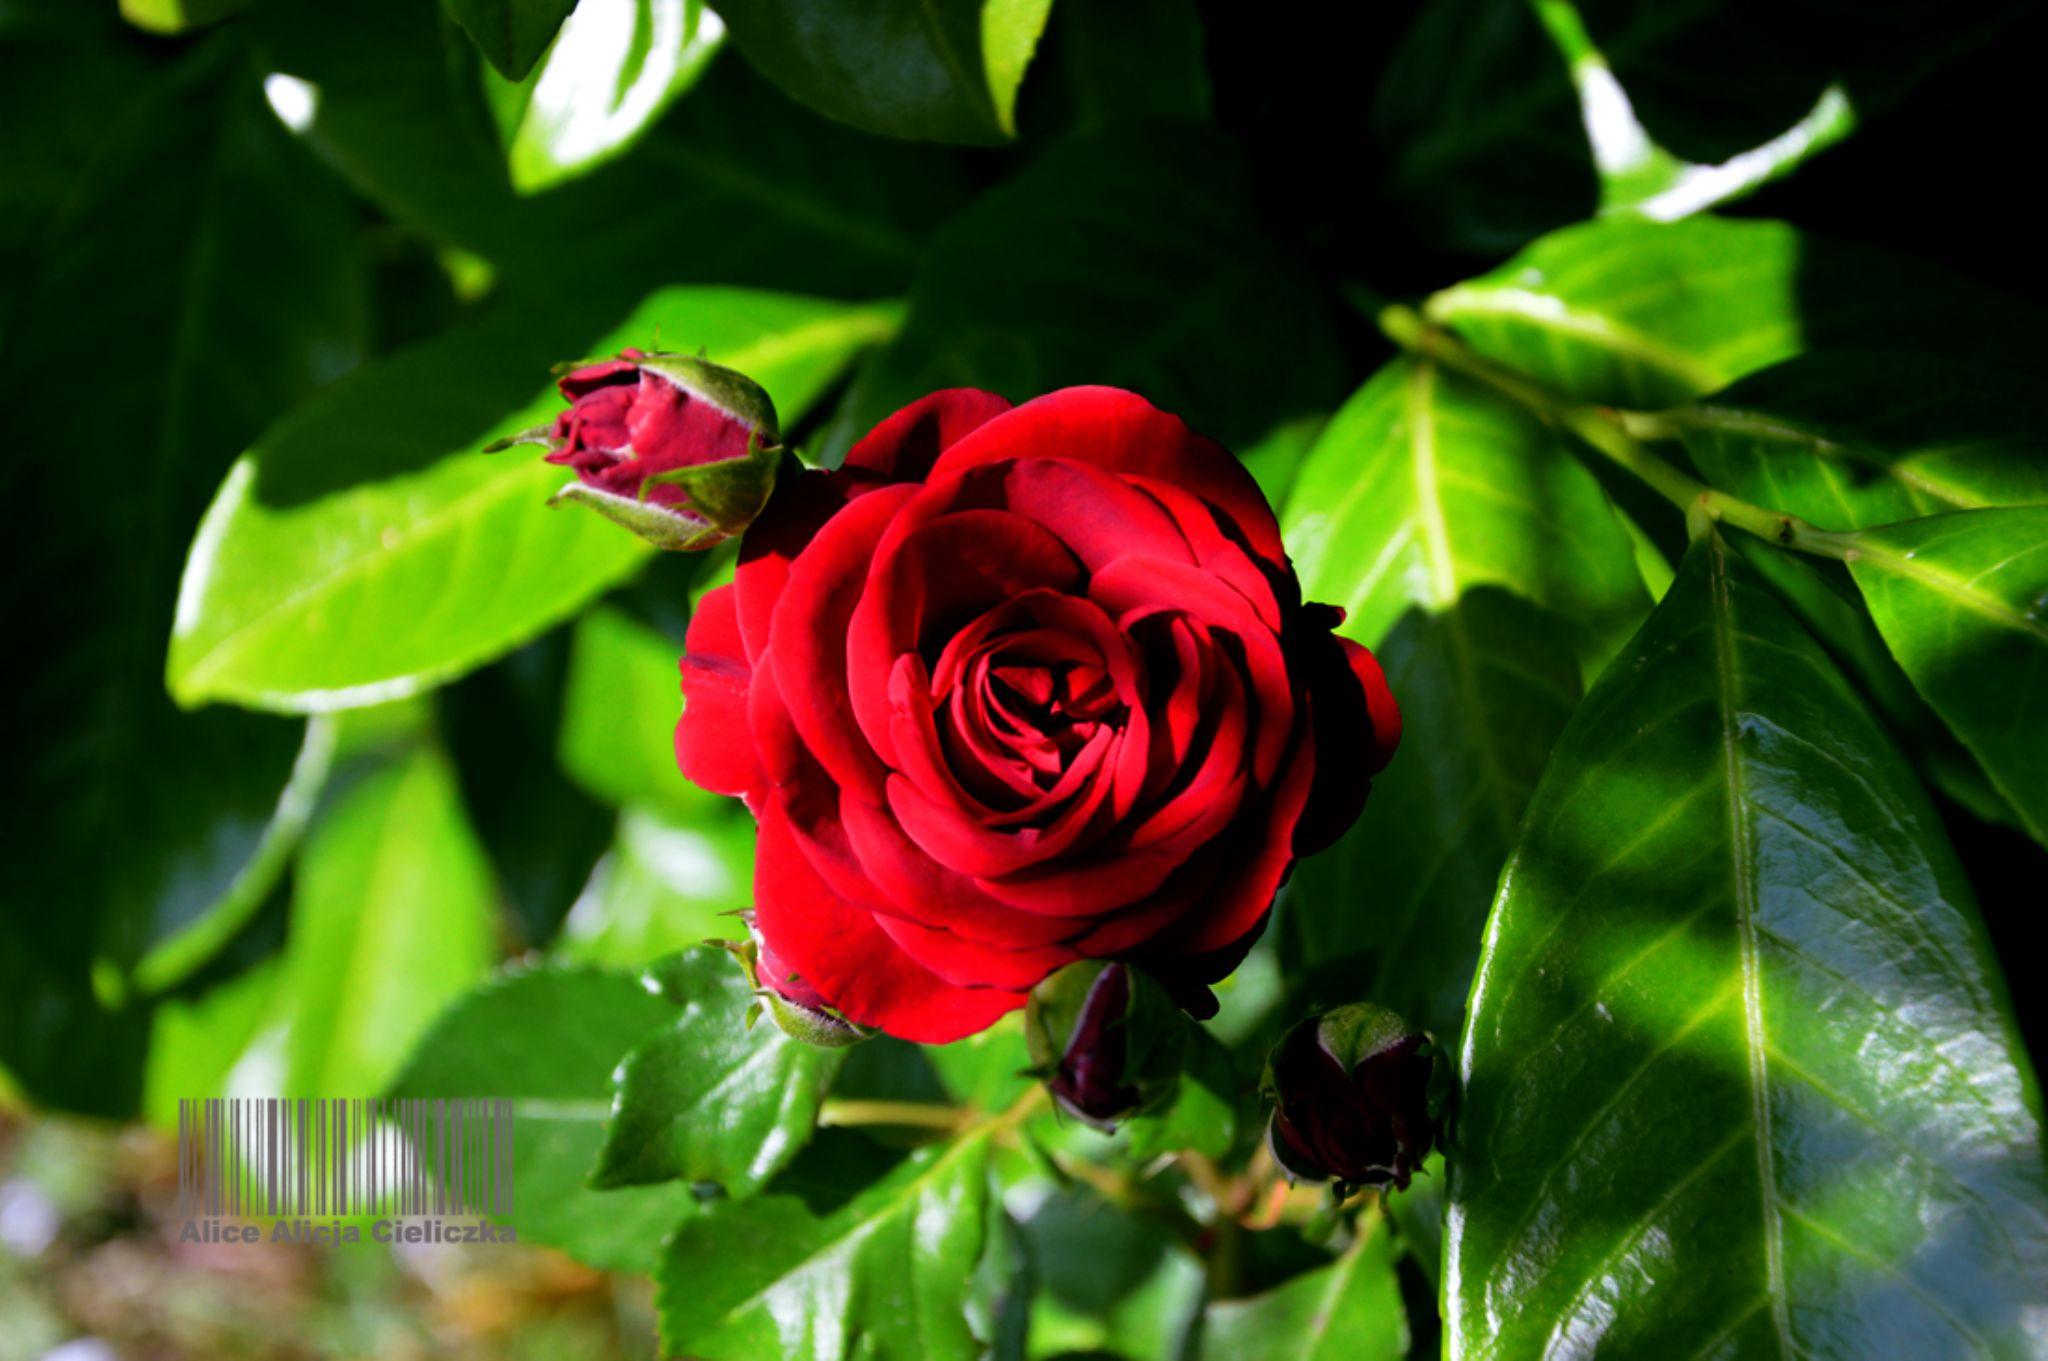 flower14 by alice240